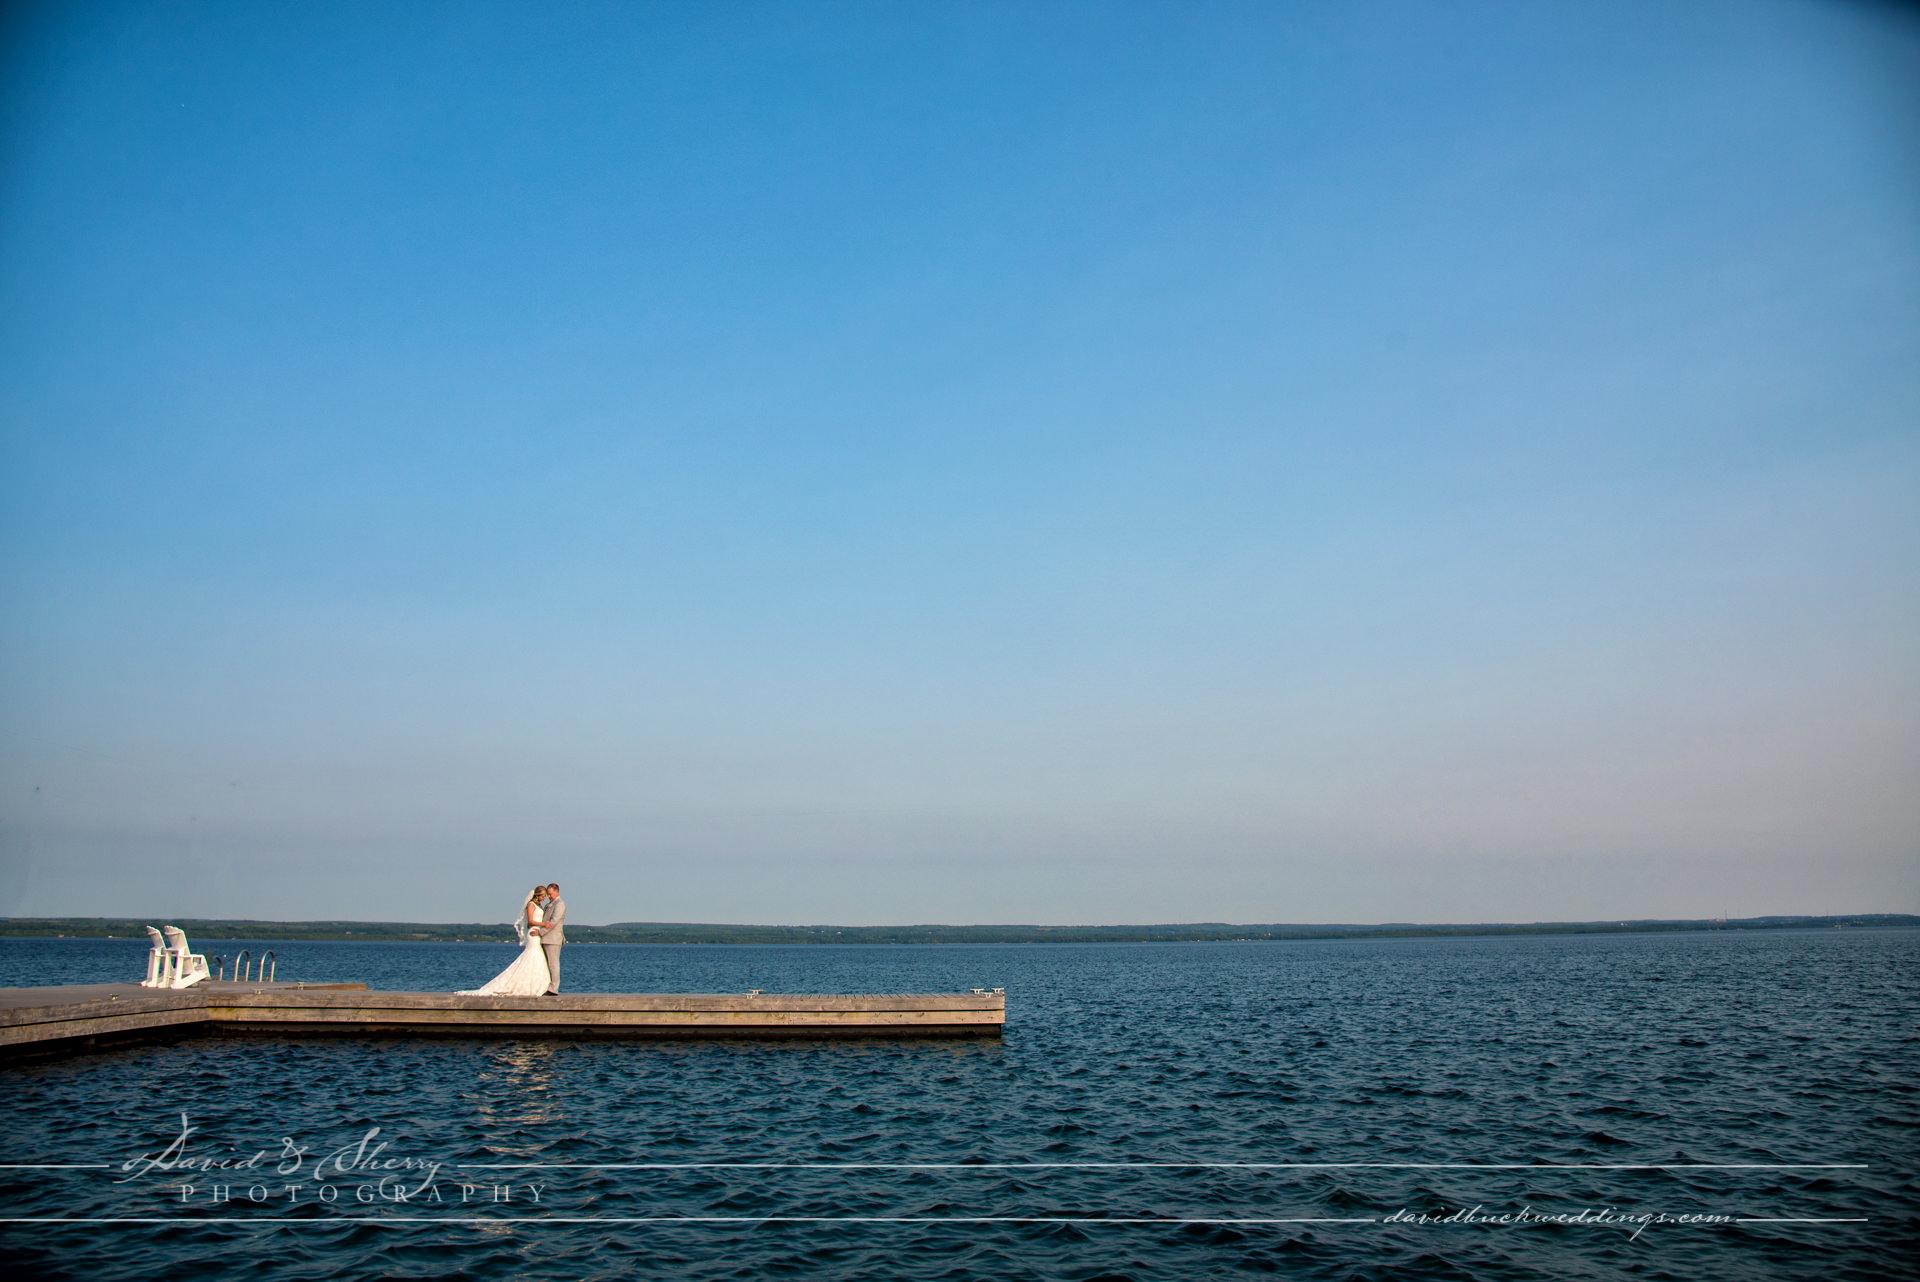 Cobble_Beach_Wedding_Photography_Owen_Sound_33